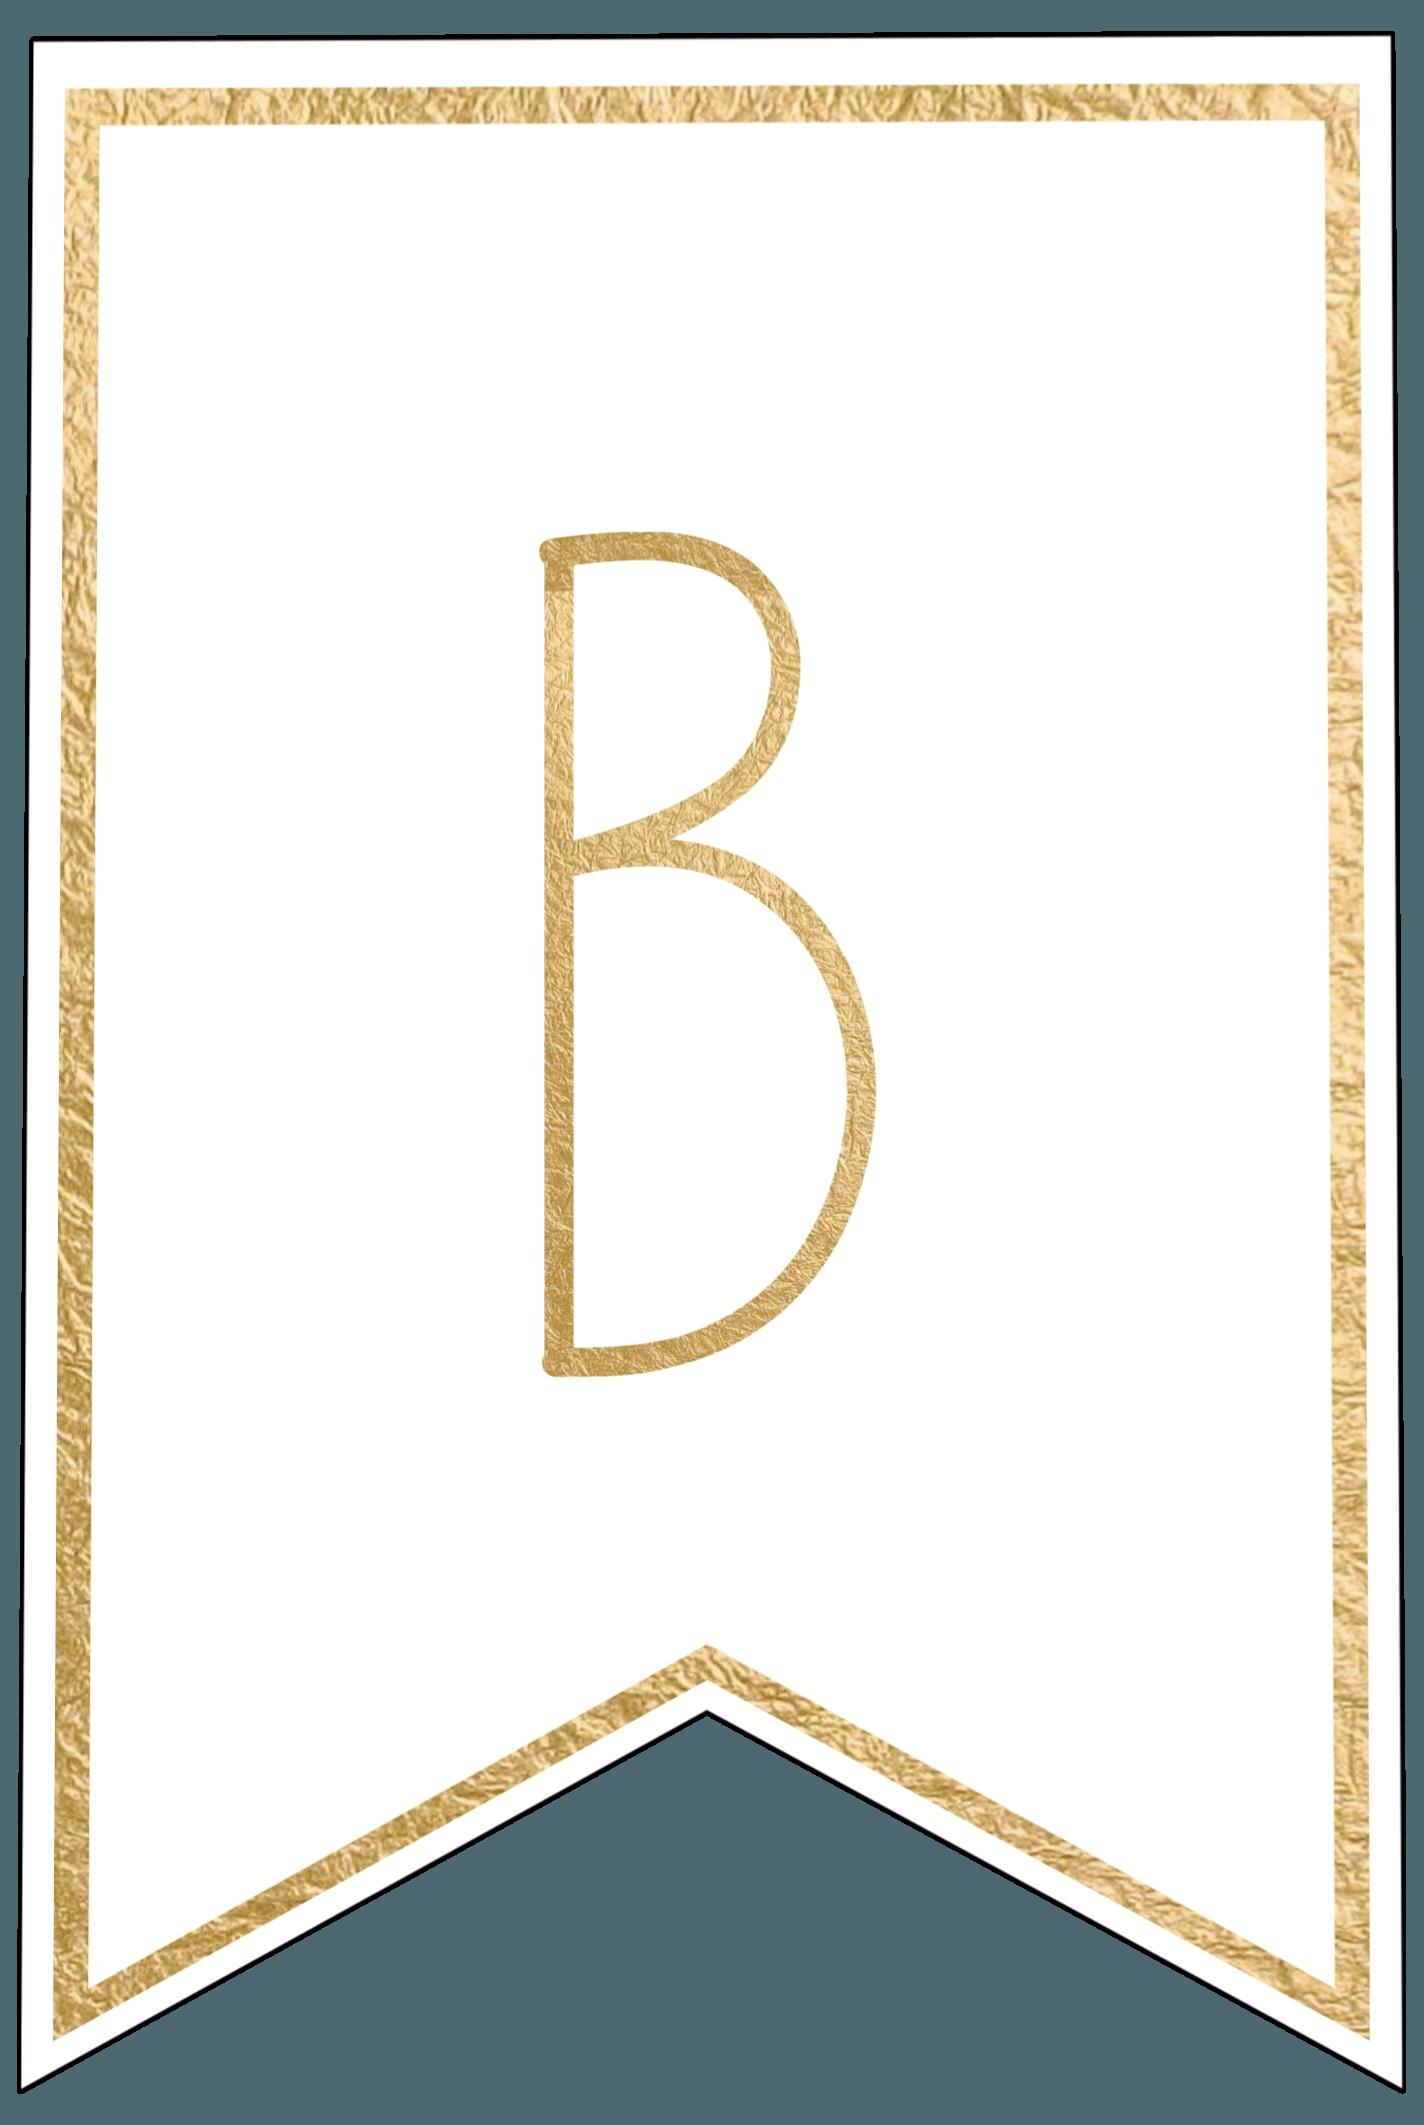 Elegant Free Printable Banner Letters | Www.pantry-Magic - Printable Banner Letters Template Free